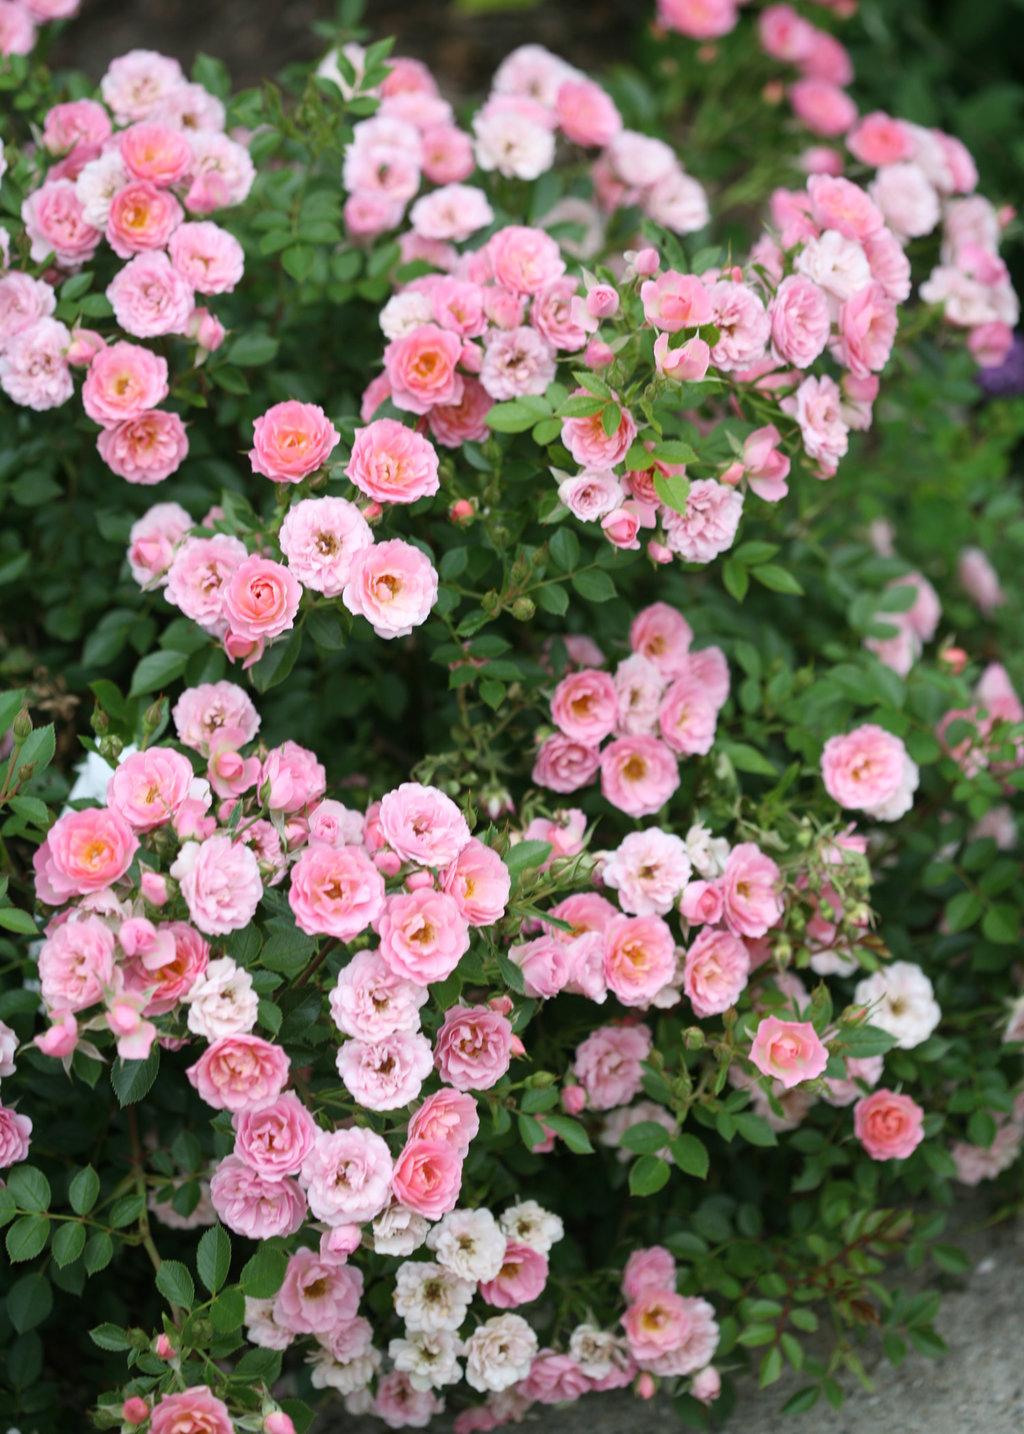 Oso easy petit pink landscape rose rosa x proven winners rosaosohappypetitpinkimg7203g mightylinksfo Images